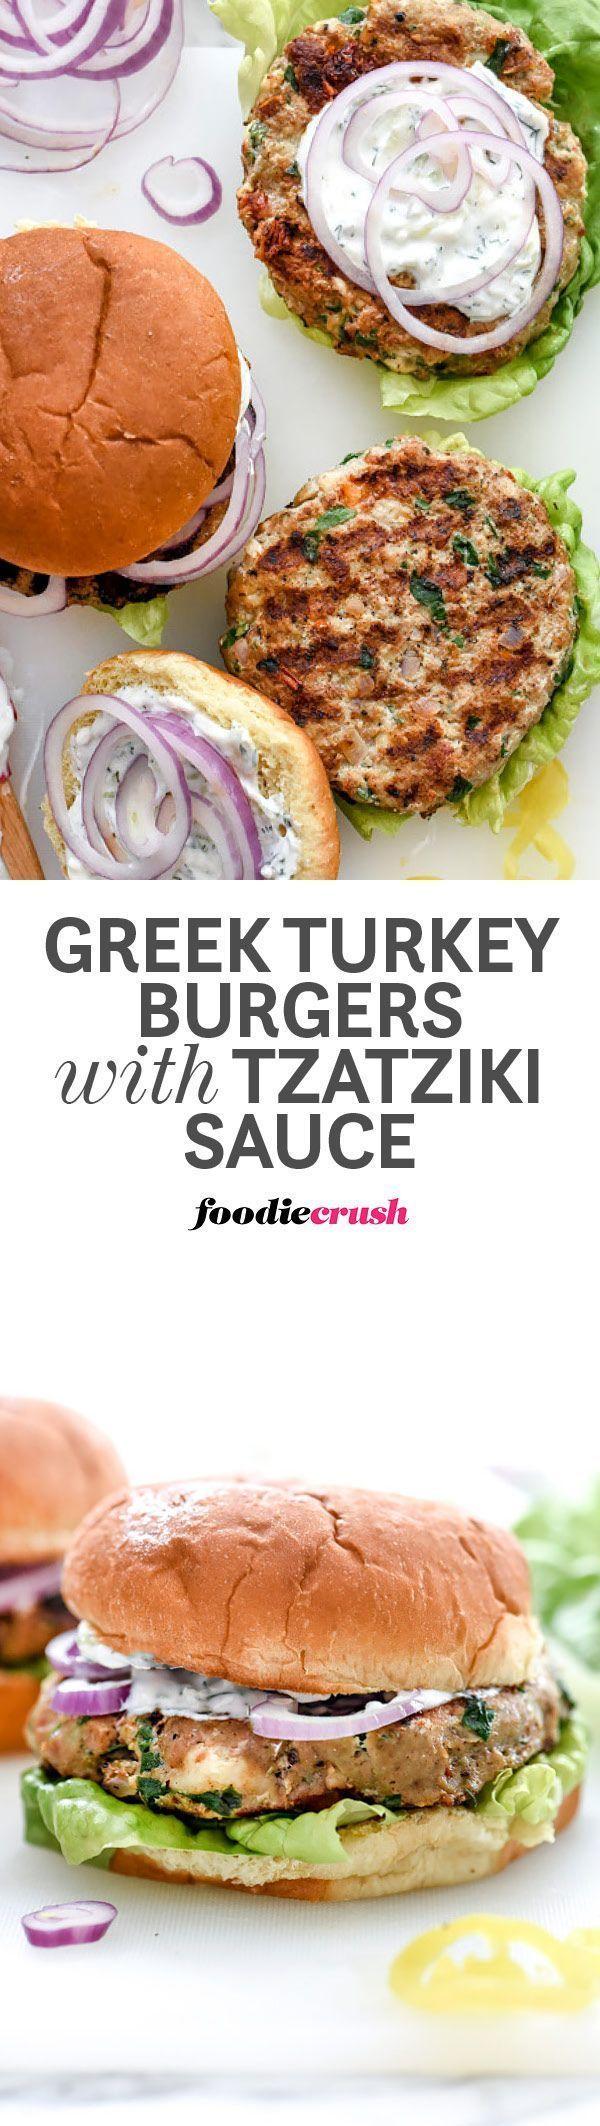 255 best Glavna jela sa mesom images on Pinterest | Kitchens, Drink ...